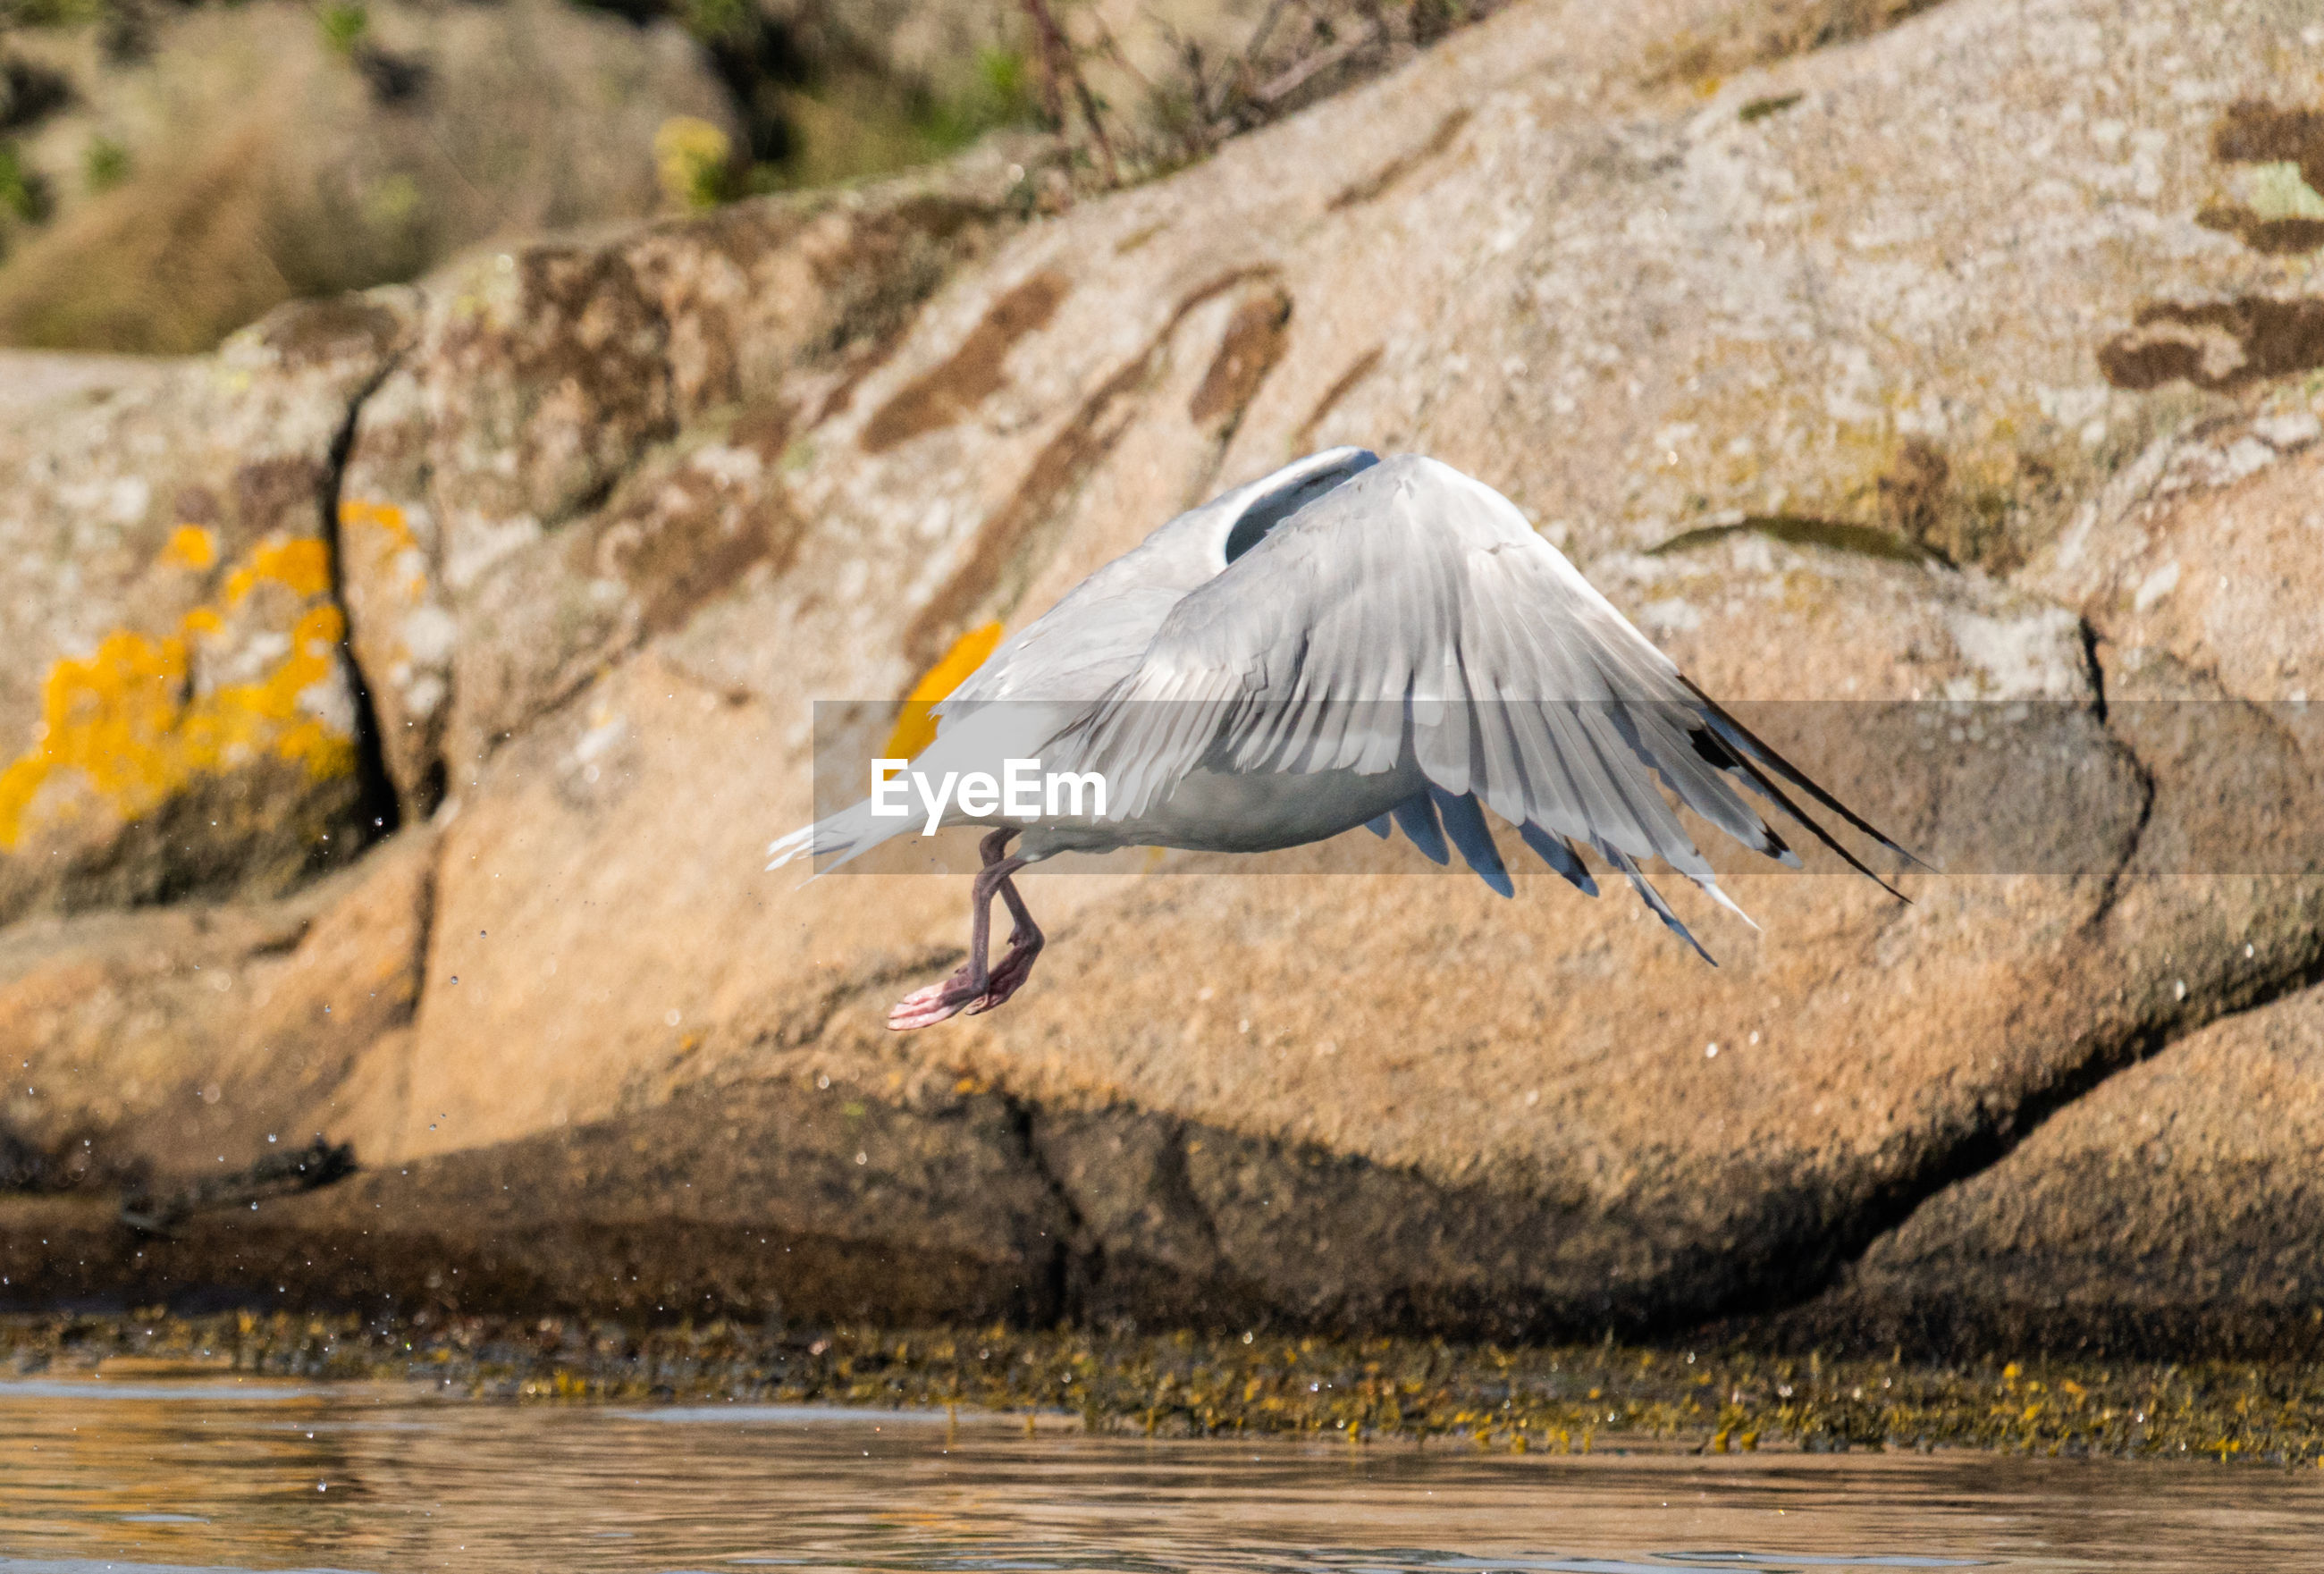 VIEW OF BIRD FLYING OVER ROCK